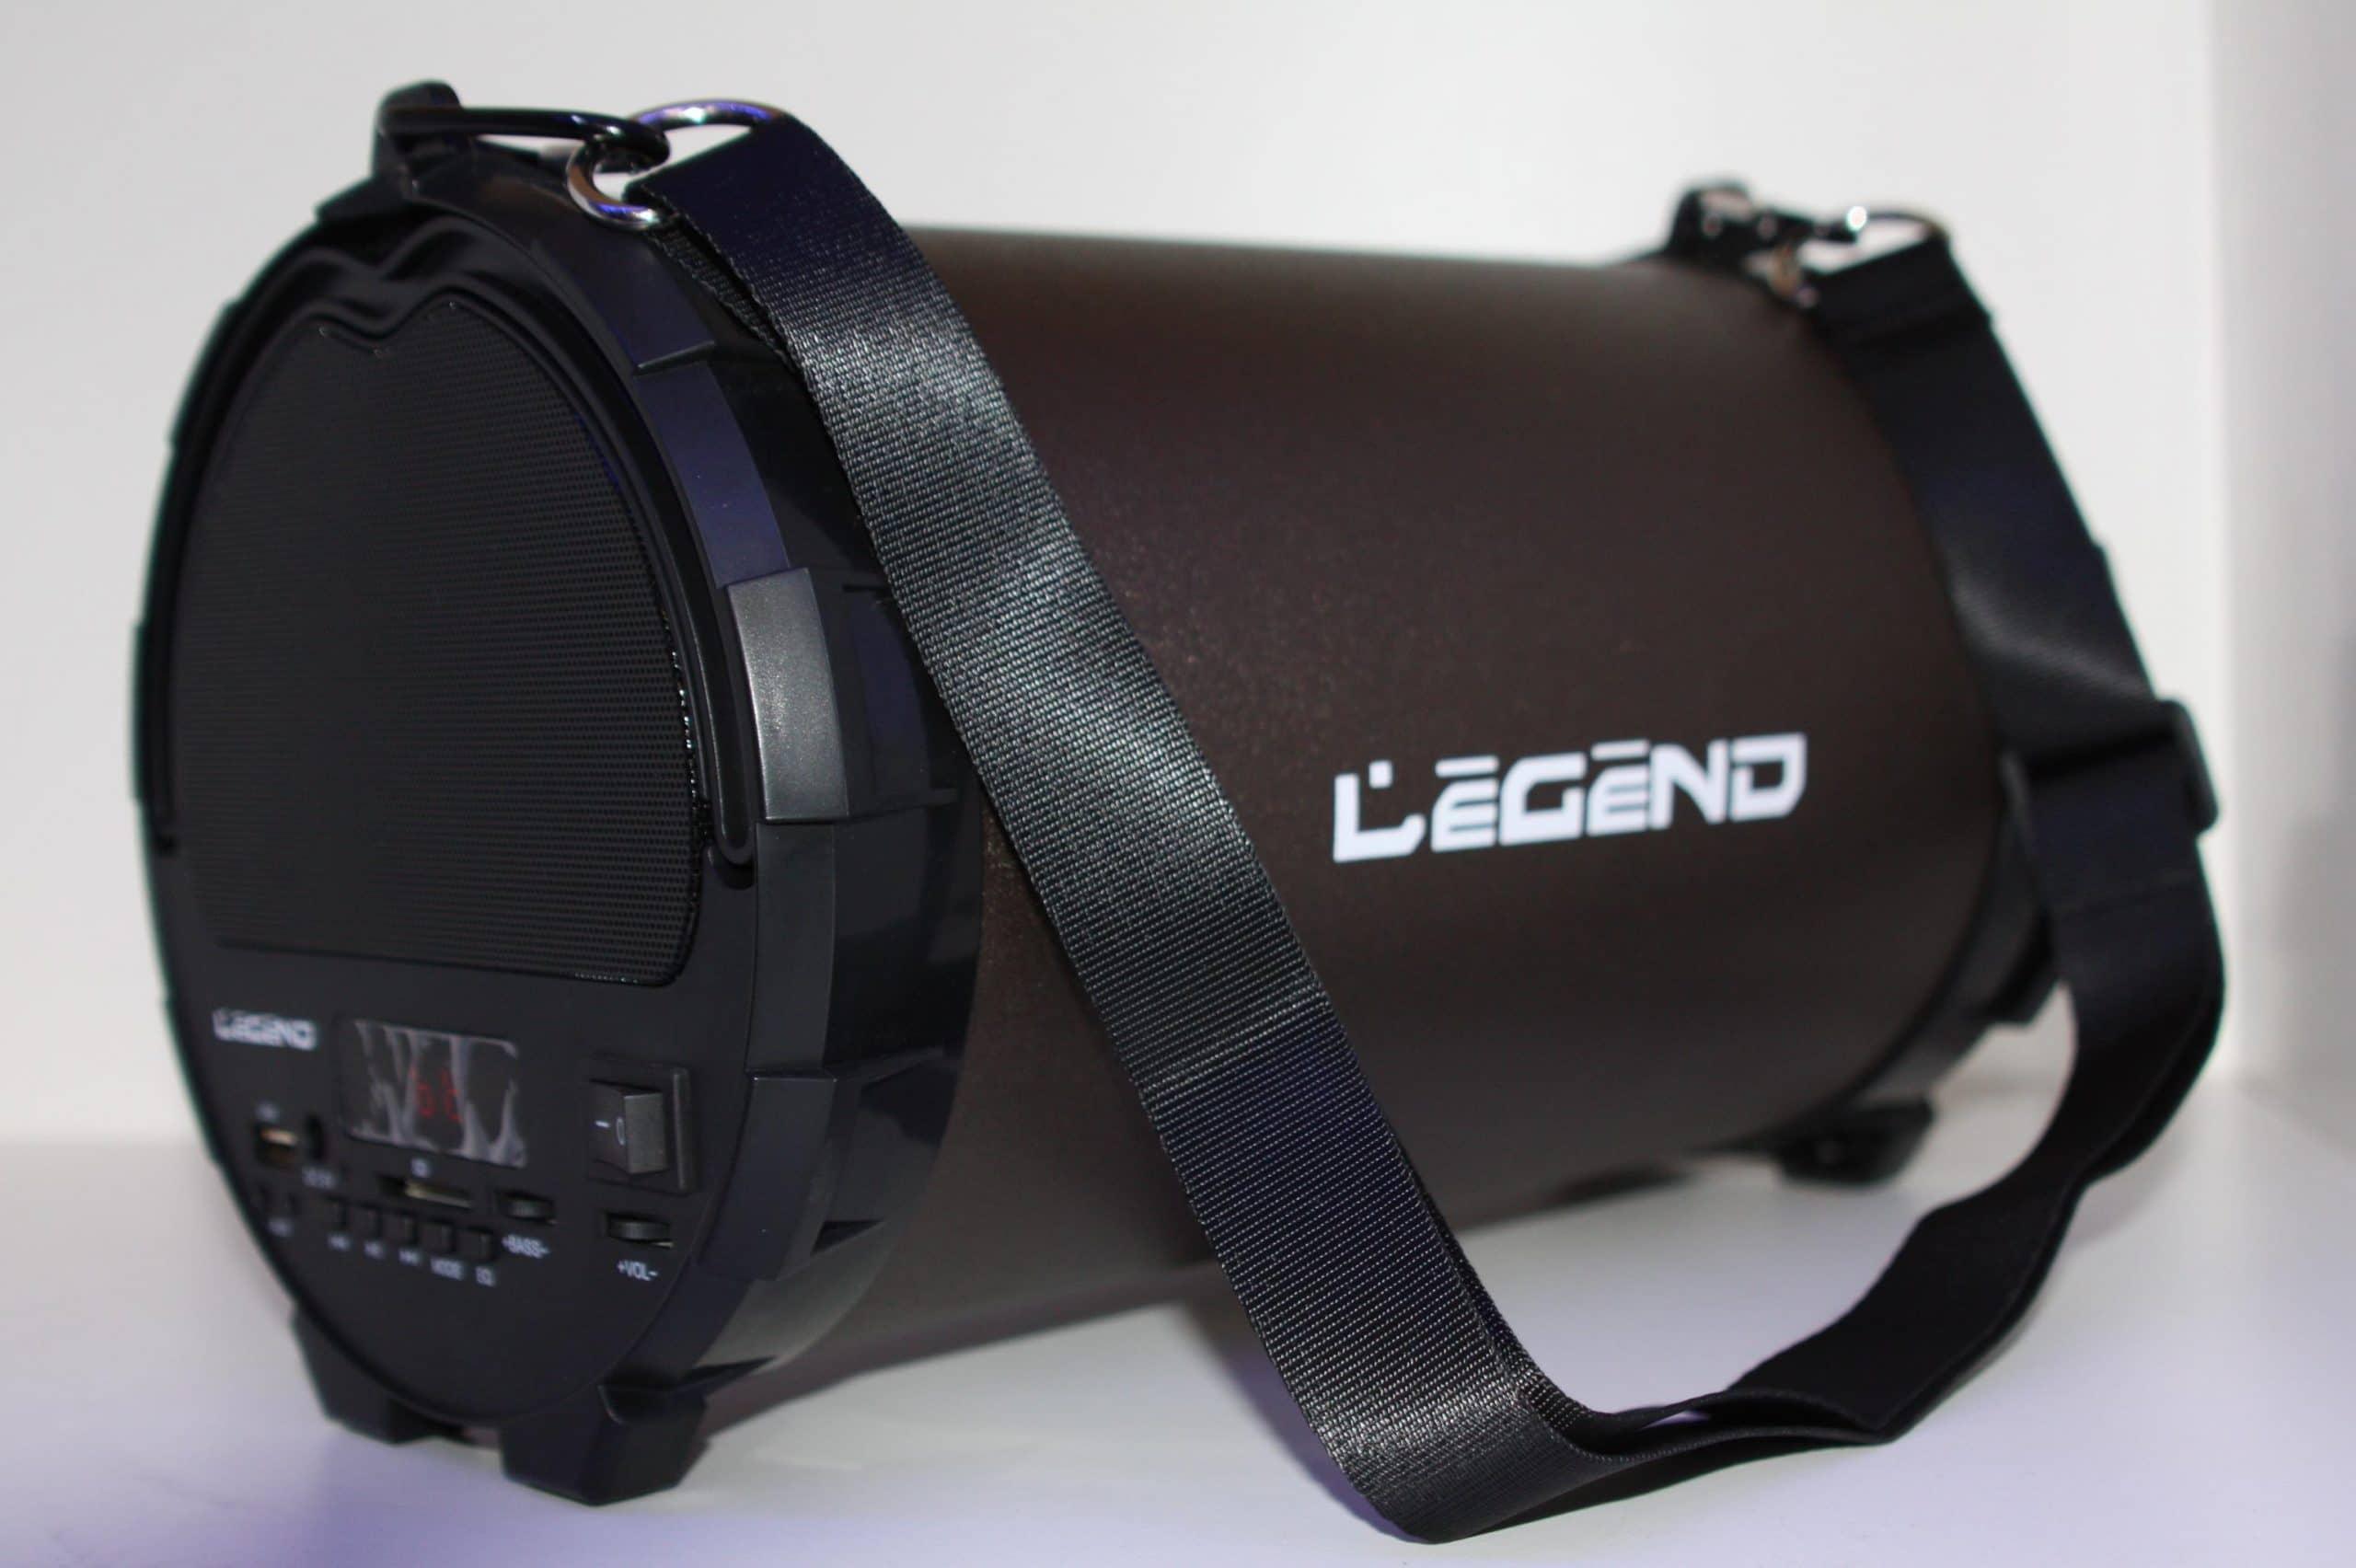 legend le-cs550 multimedia bluetooth speaker